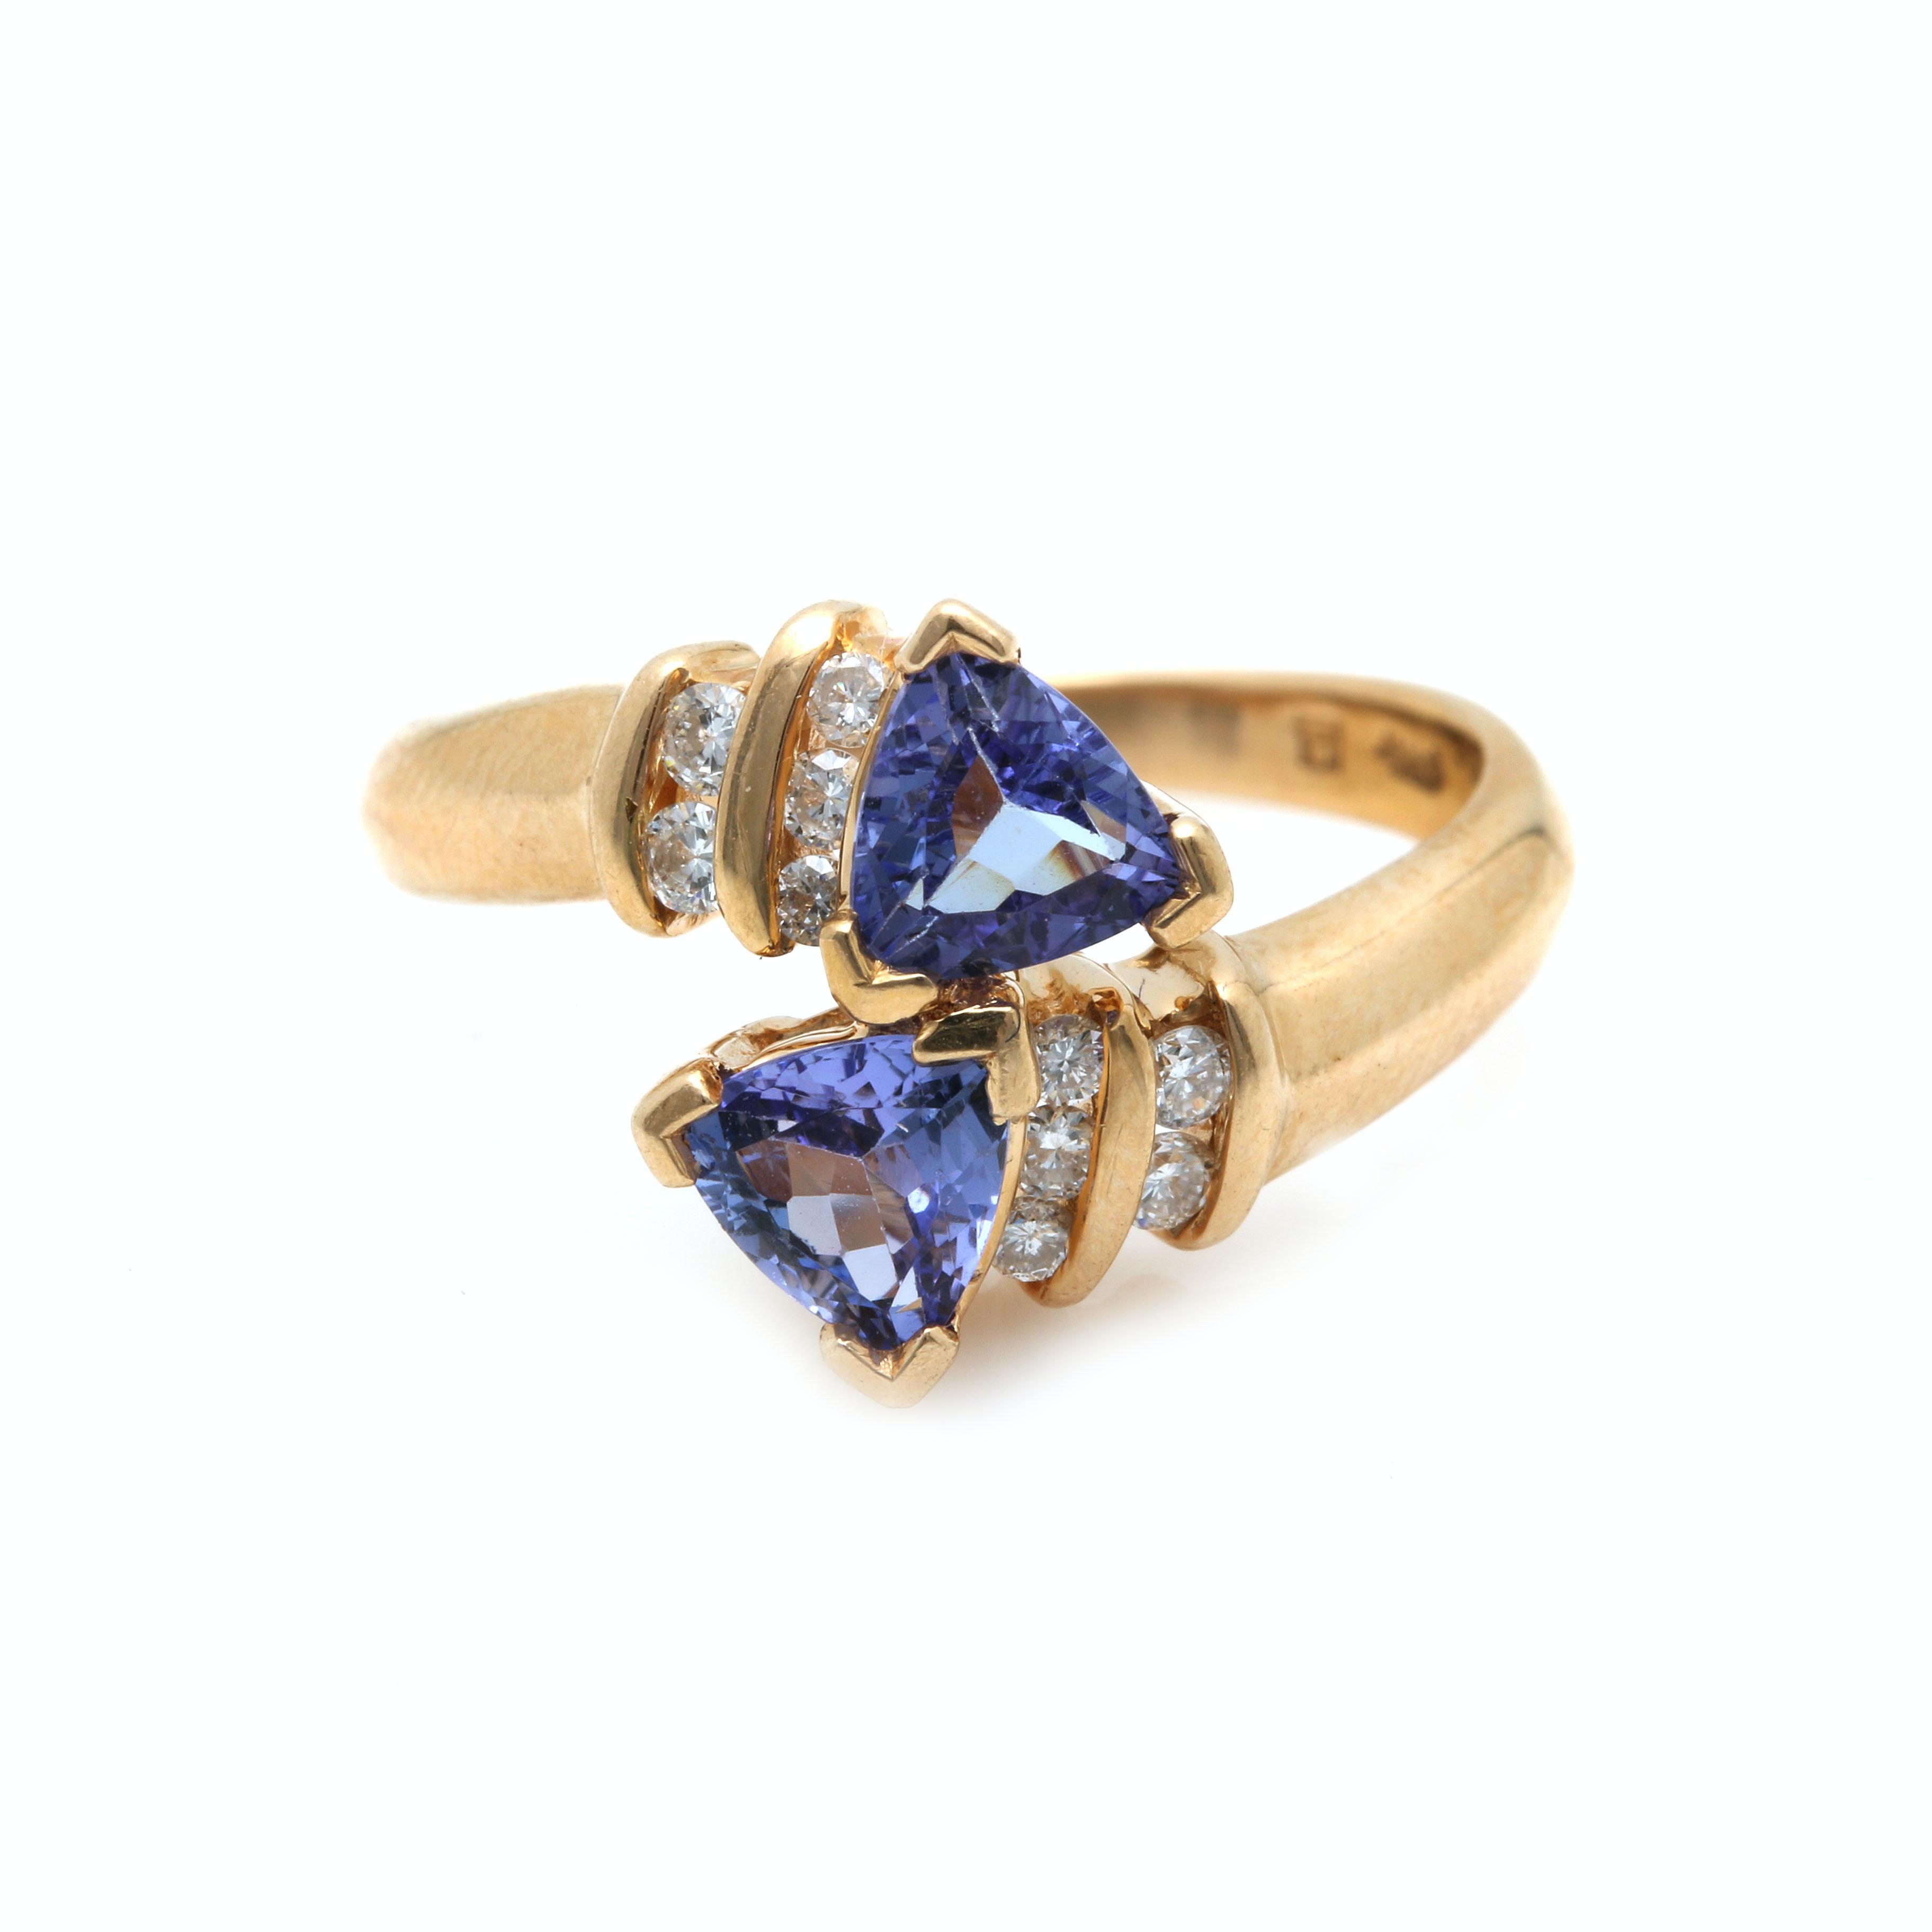 14K Yellow Gold Diamond and Tanzanite Bypass Ring